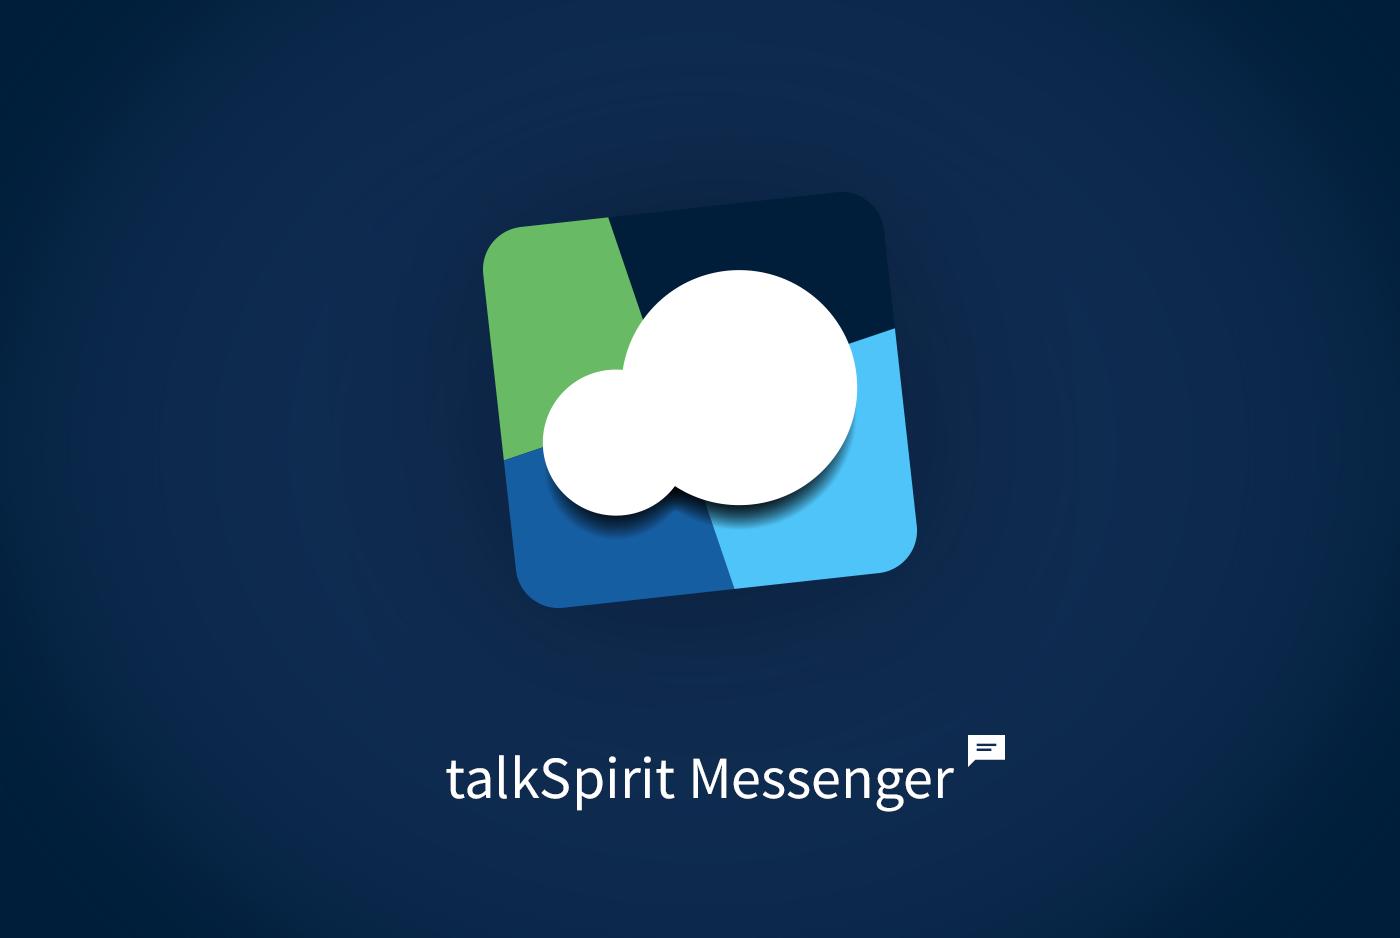 talkspirit Messenger